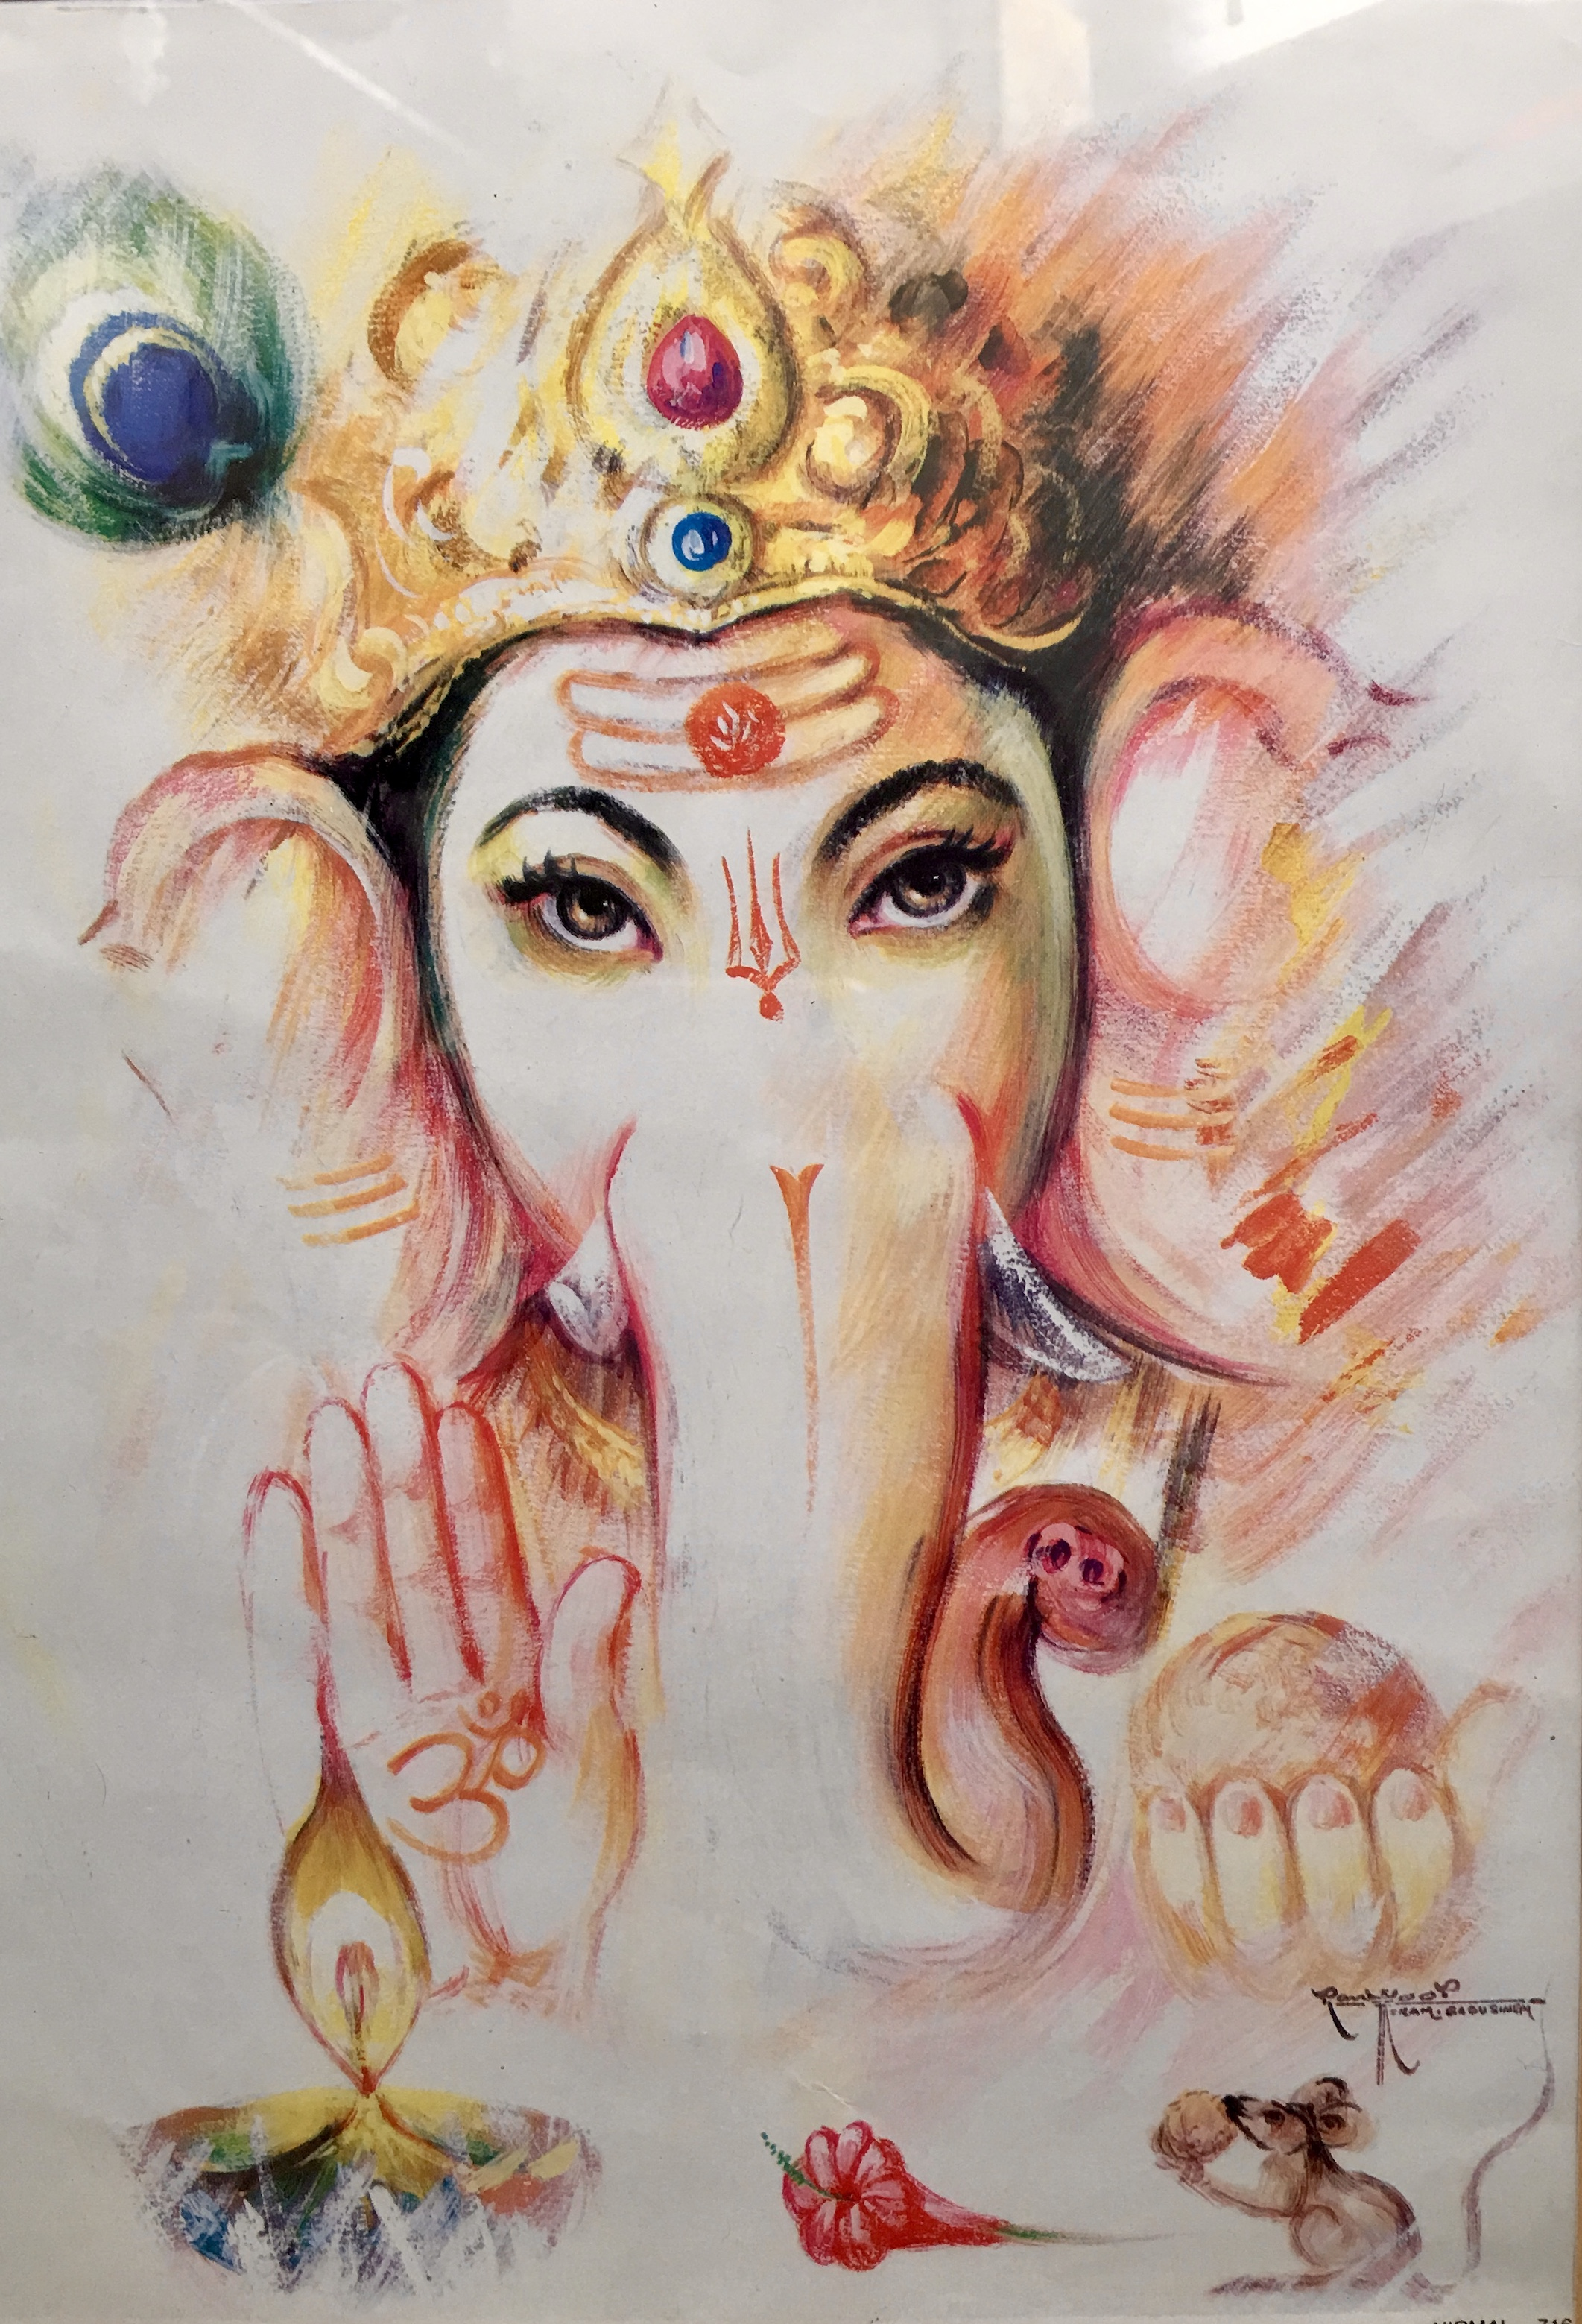 Yoga, Myth & Magic series workshop 1  Ganesha – Grounding and Positivity with Rosemary Booker - Price £25